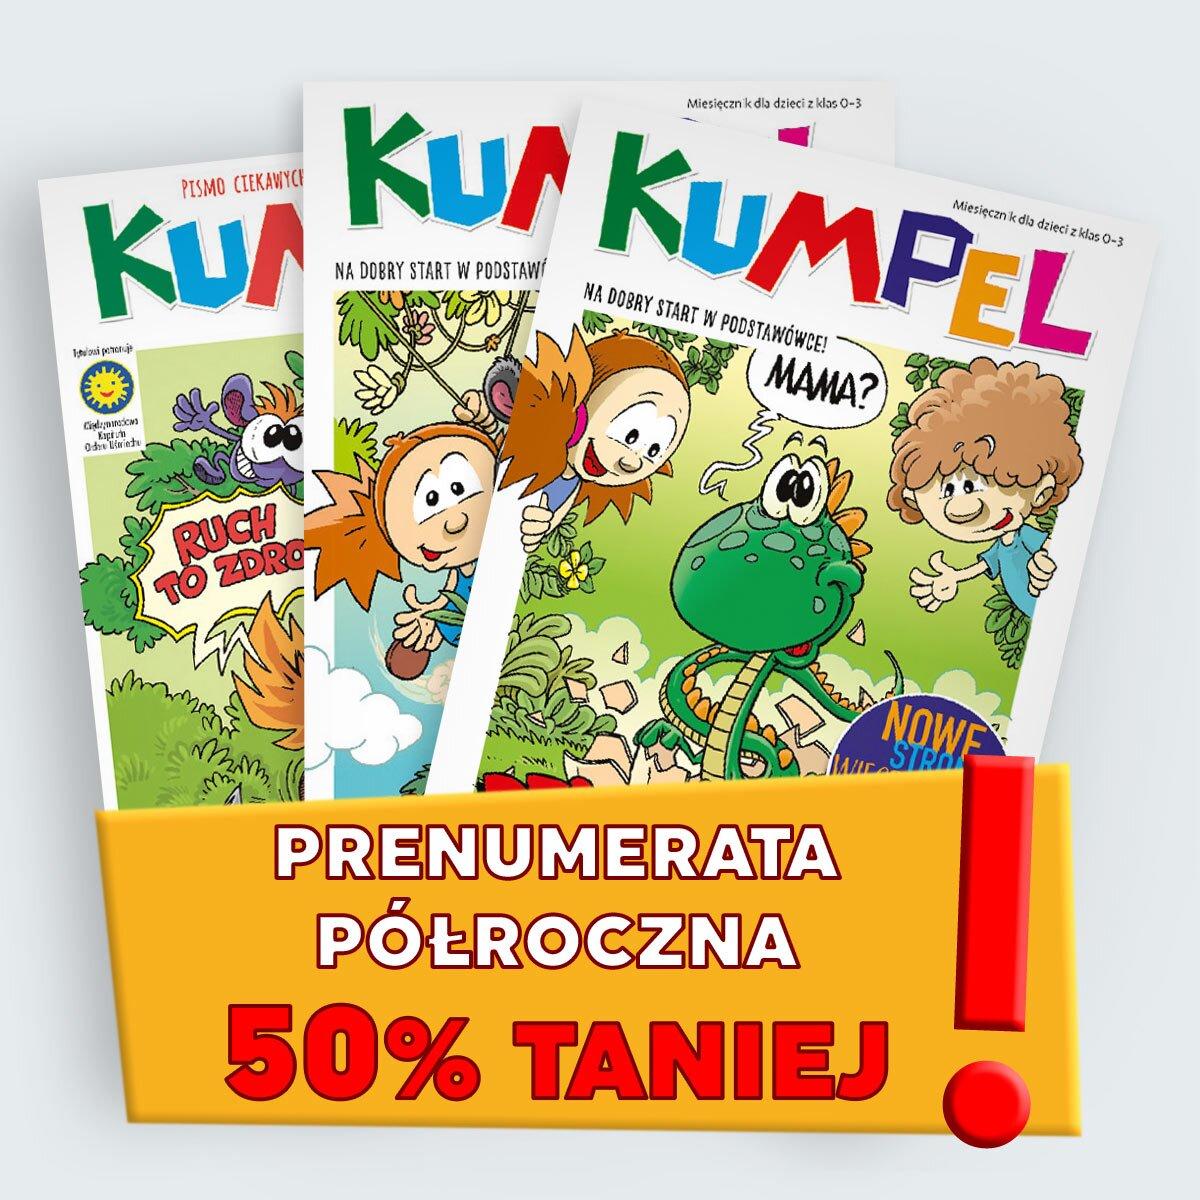 Kumpel 2019 prenumerata polroczna rabat promocyjna cena